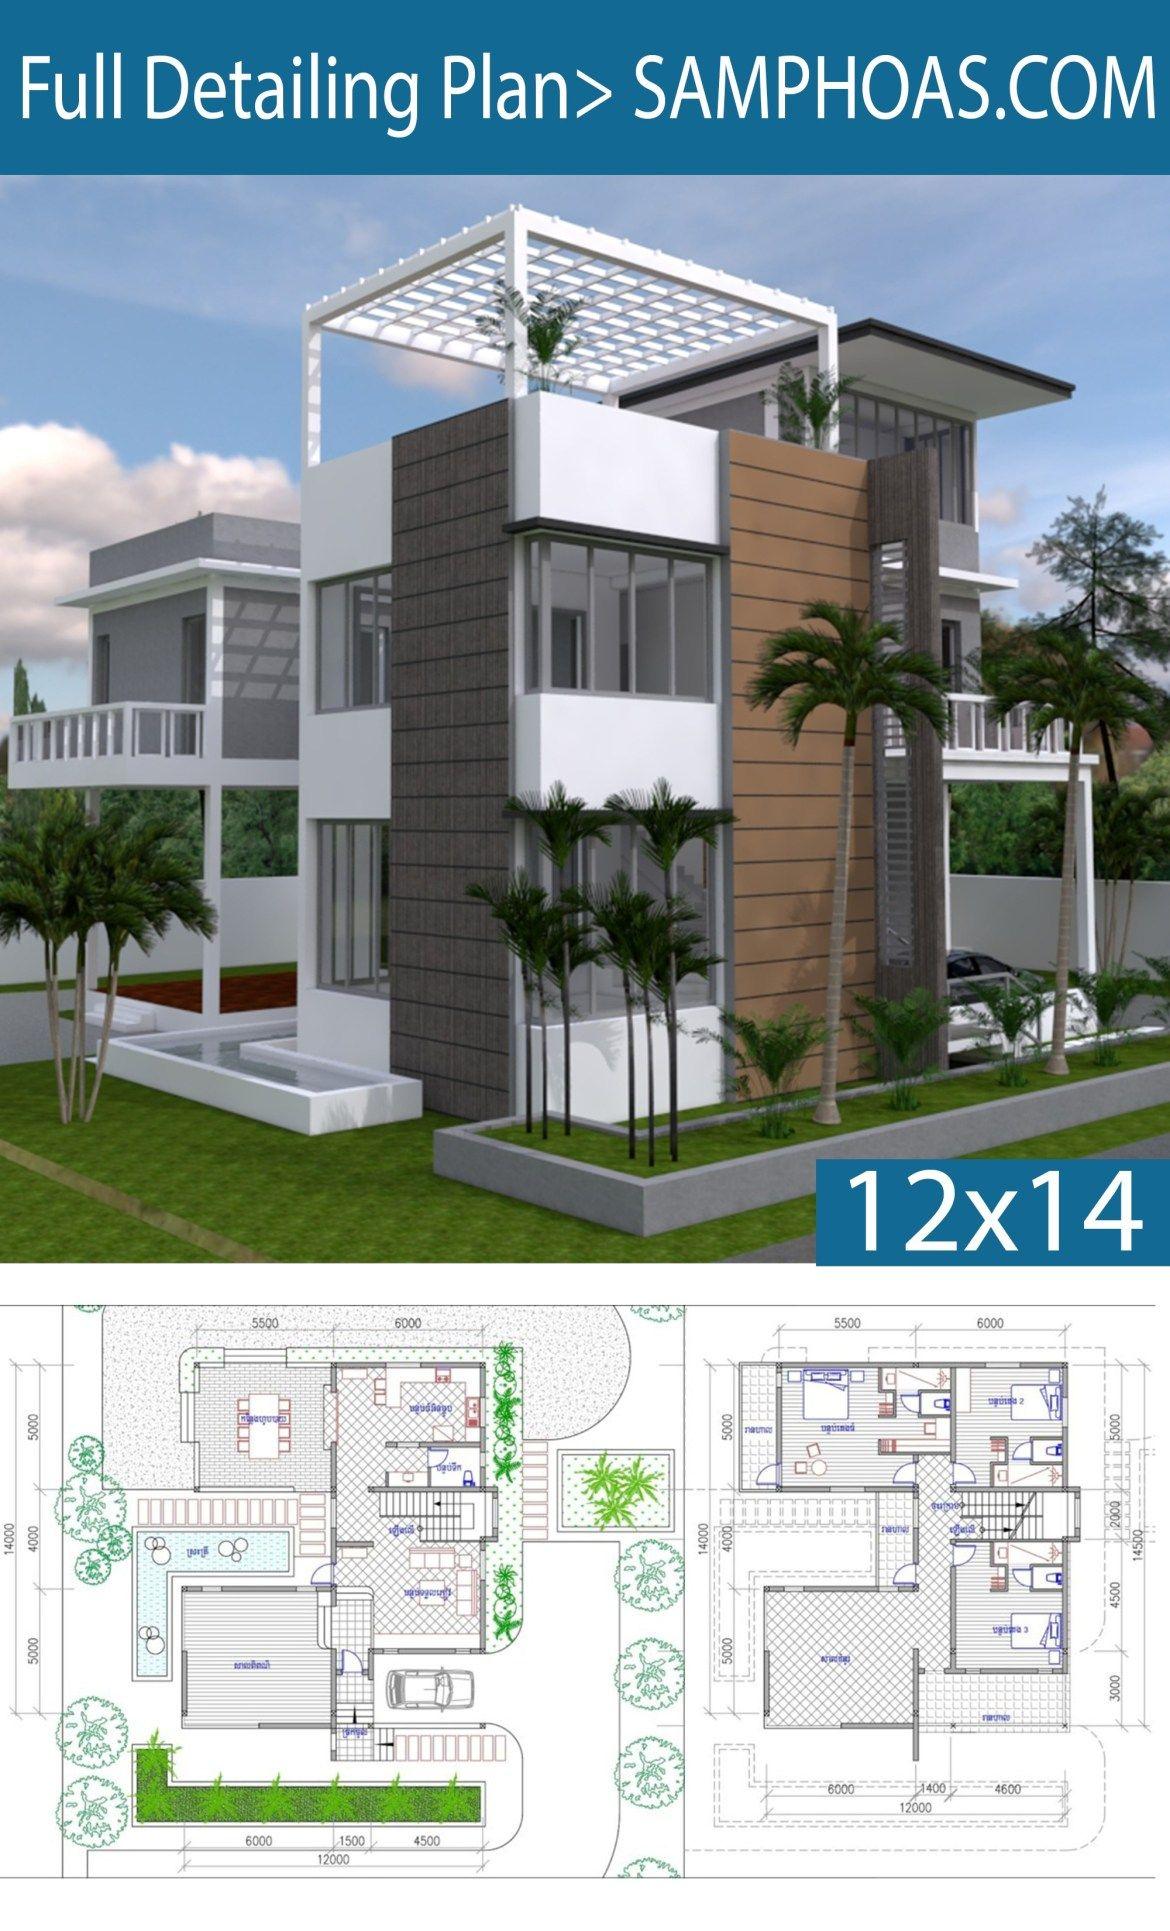 3 Story House Plan 12x14m With 4 Bedrooms Rumah Indah Arsitektur Rumah Arsitektur